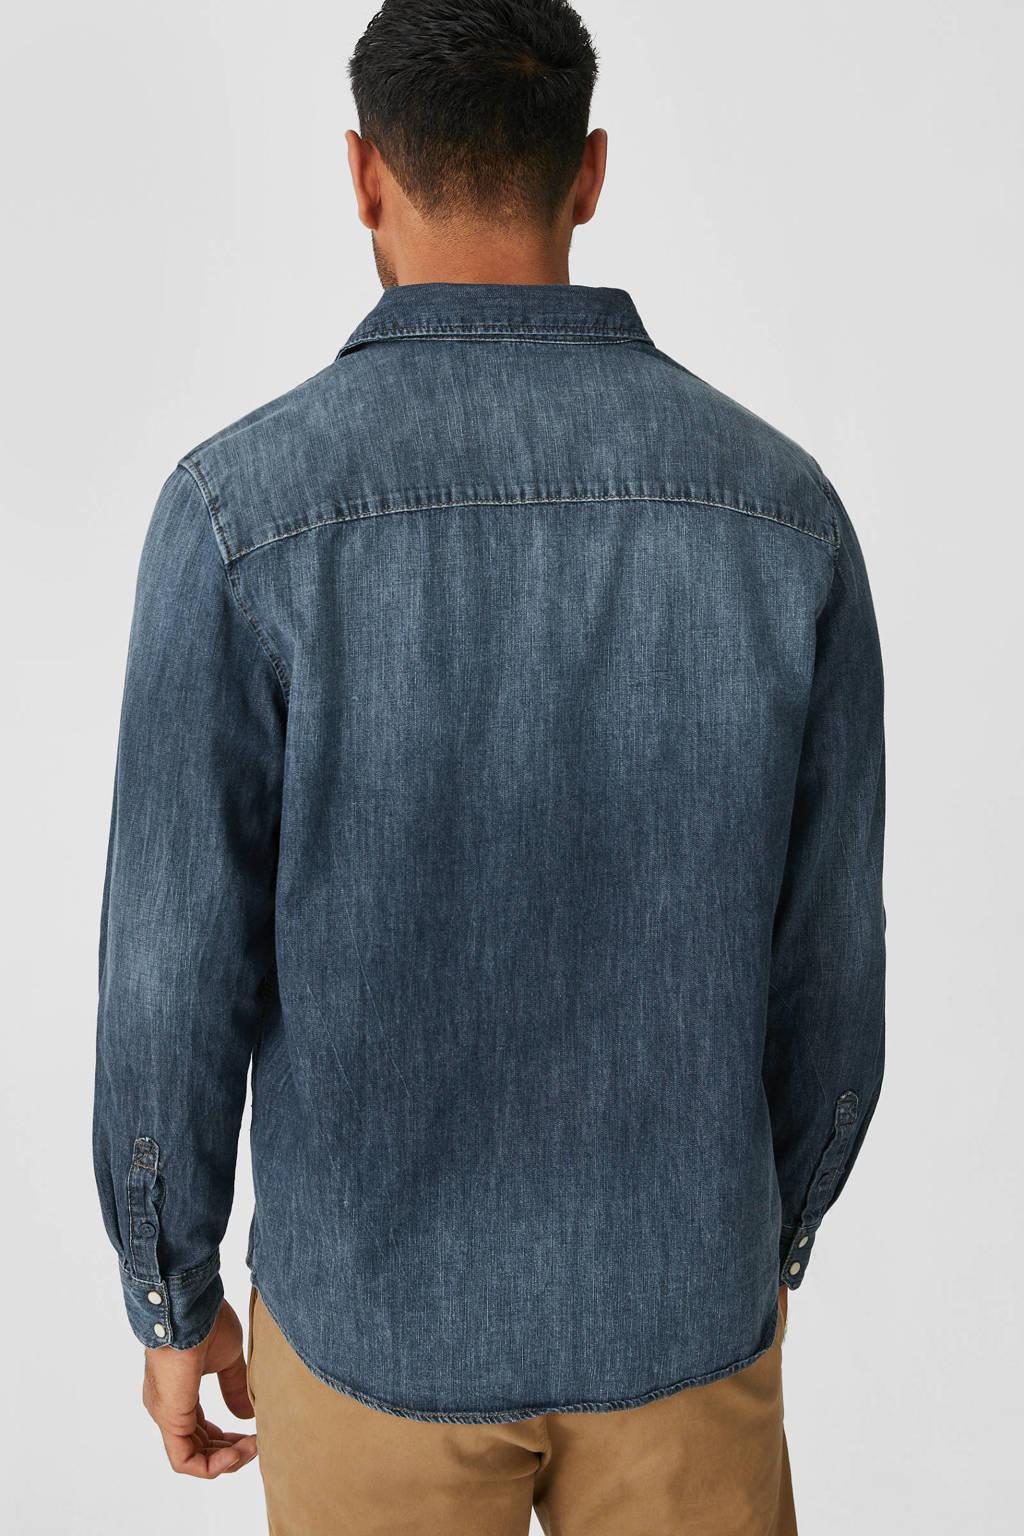 C&A The Denim regular fit denim overhemd blauw, Blauw